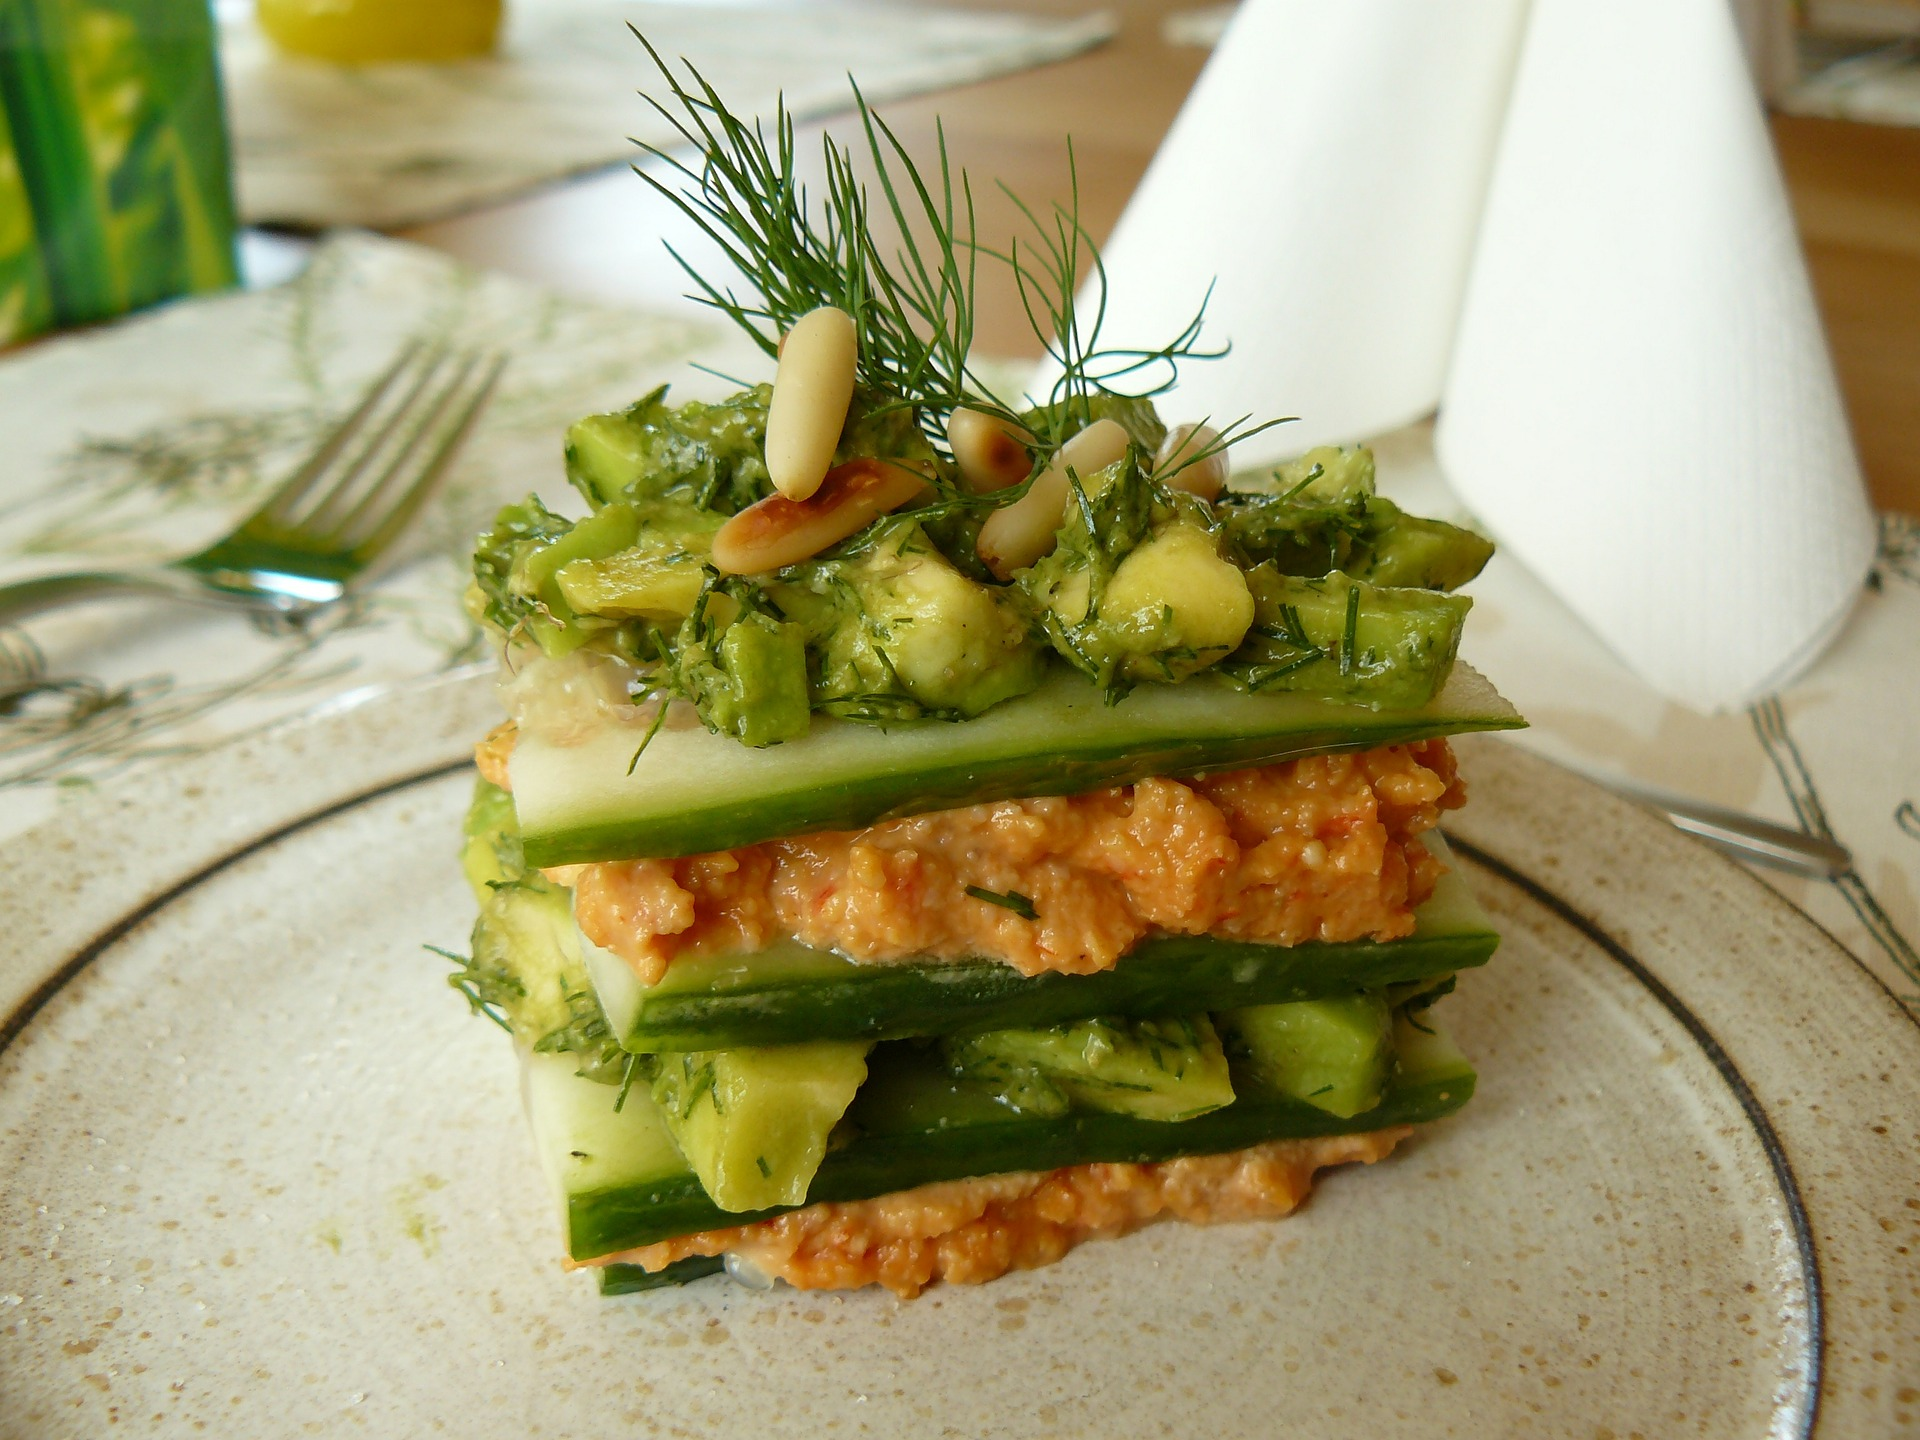 Lasaña de Calabacín, lasaña de verano, lasaña de verduras, lasaña sin carne